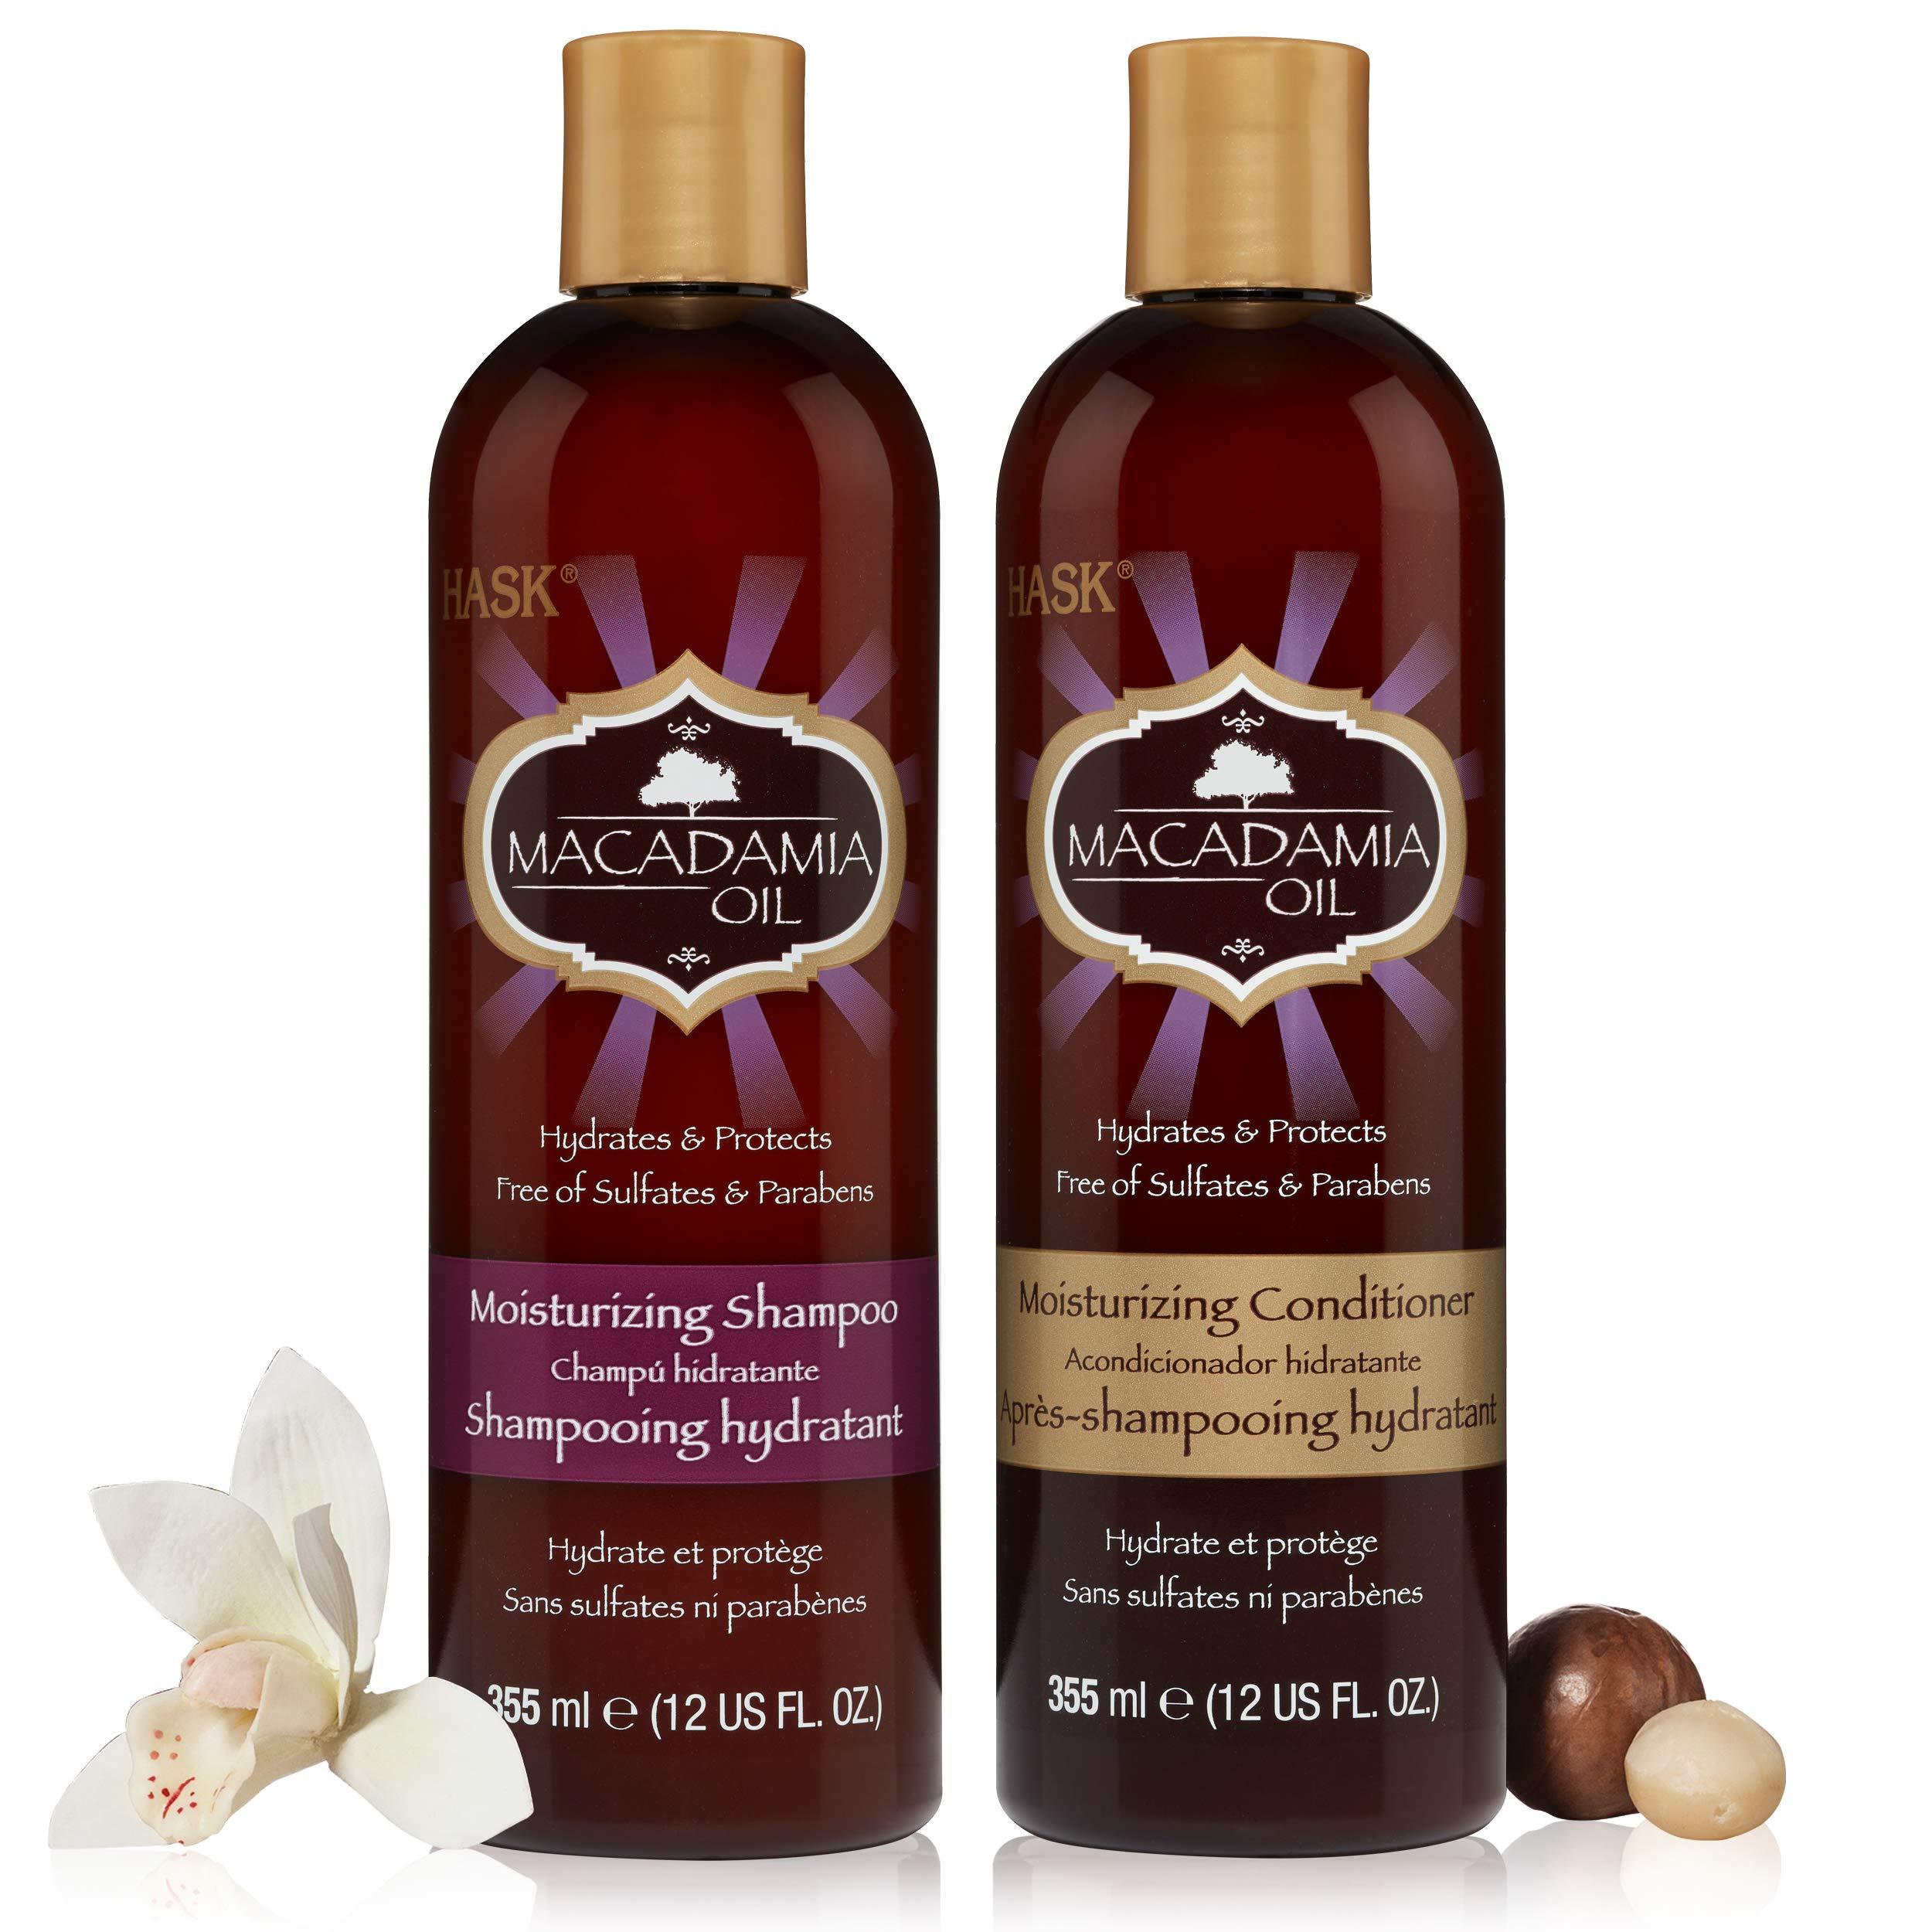 HASK MACADAMIA OIL Shampoo and Conditioner Set Moisturizing - Color safe, gluten-free, sulfate-free, paraben-free - 1 Shampoo and 1 Conditioner